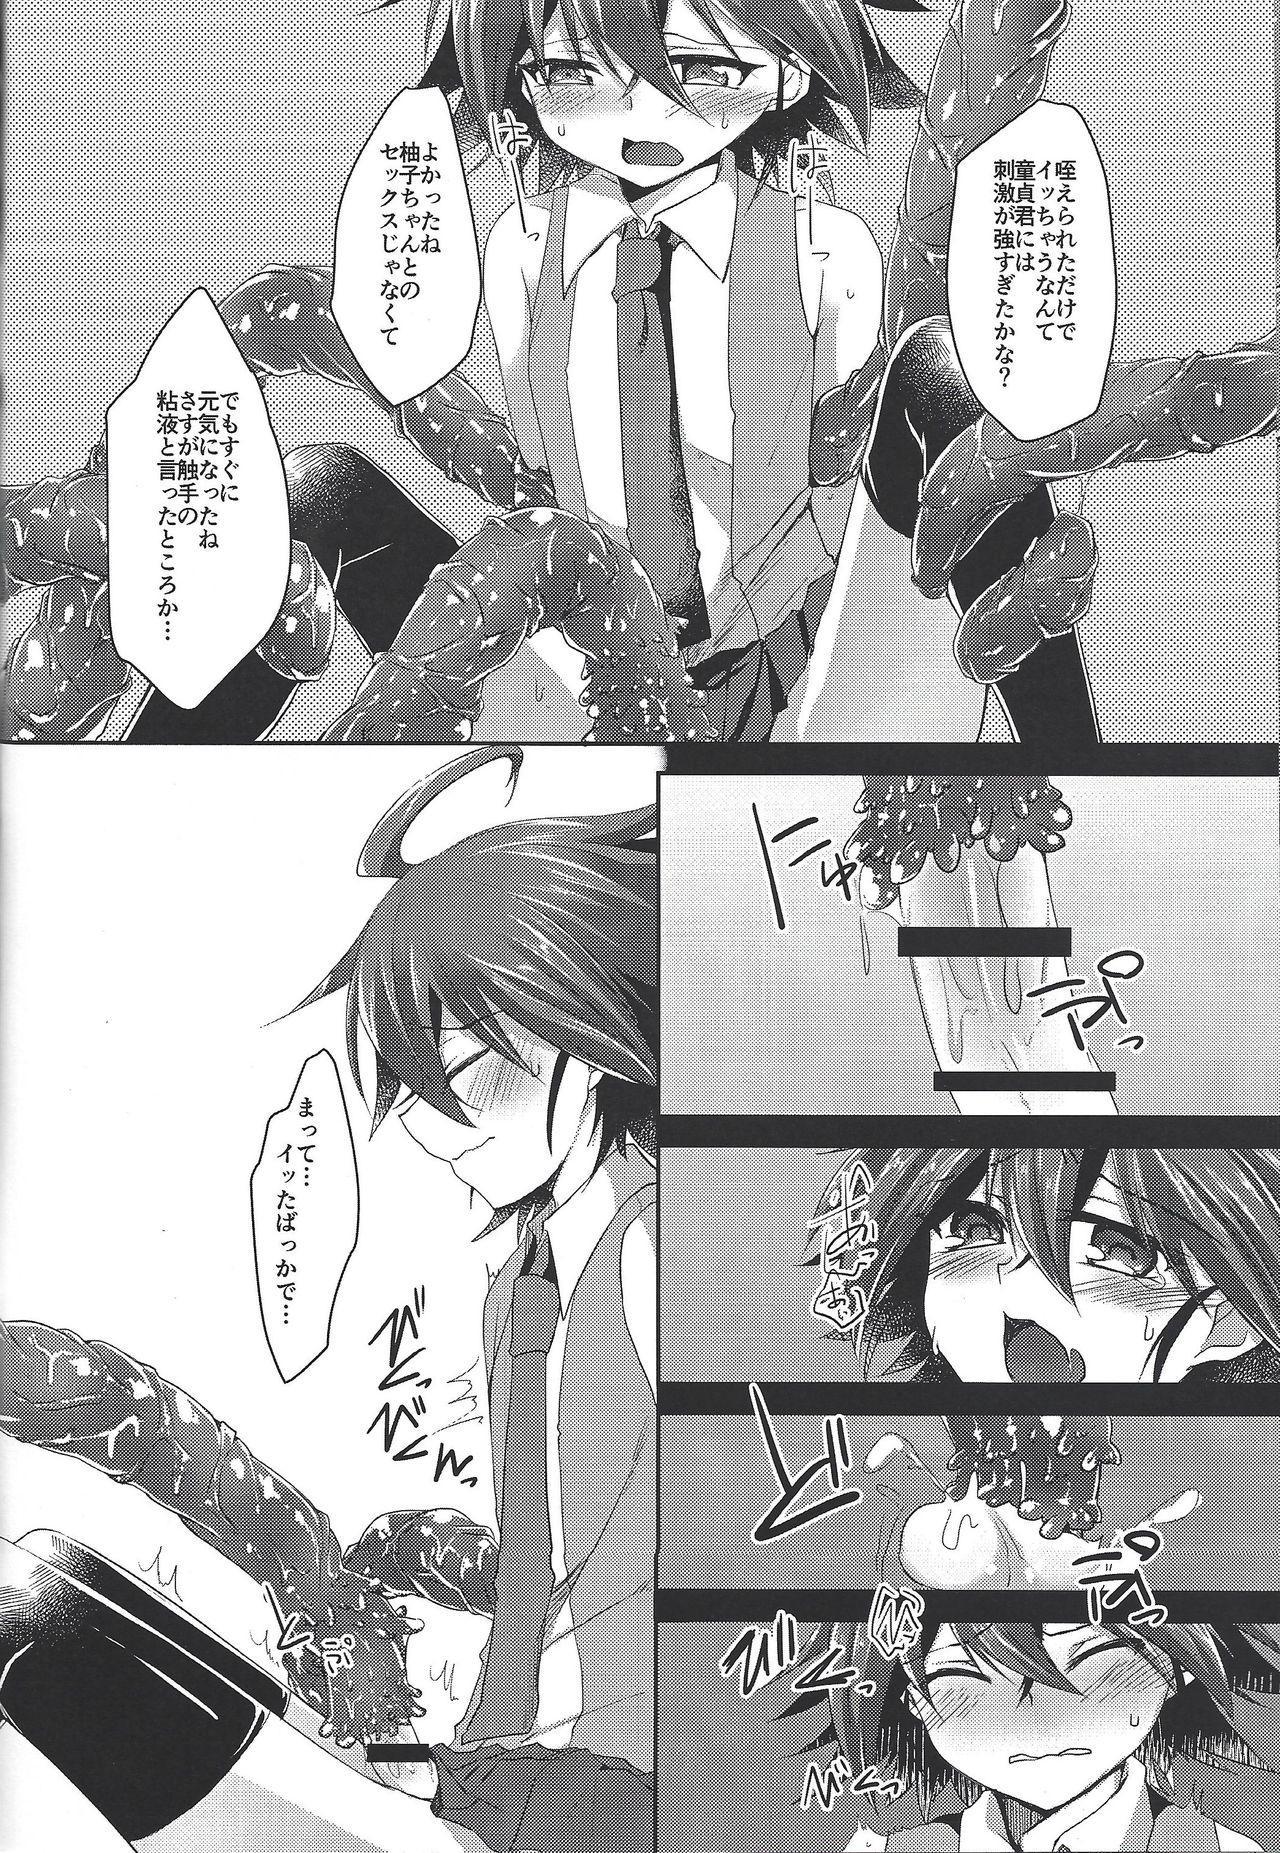 Kyousei Seieki Sakushu 10